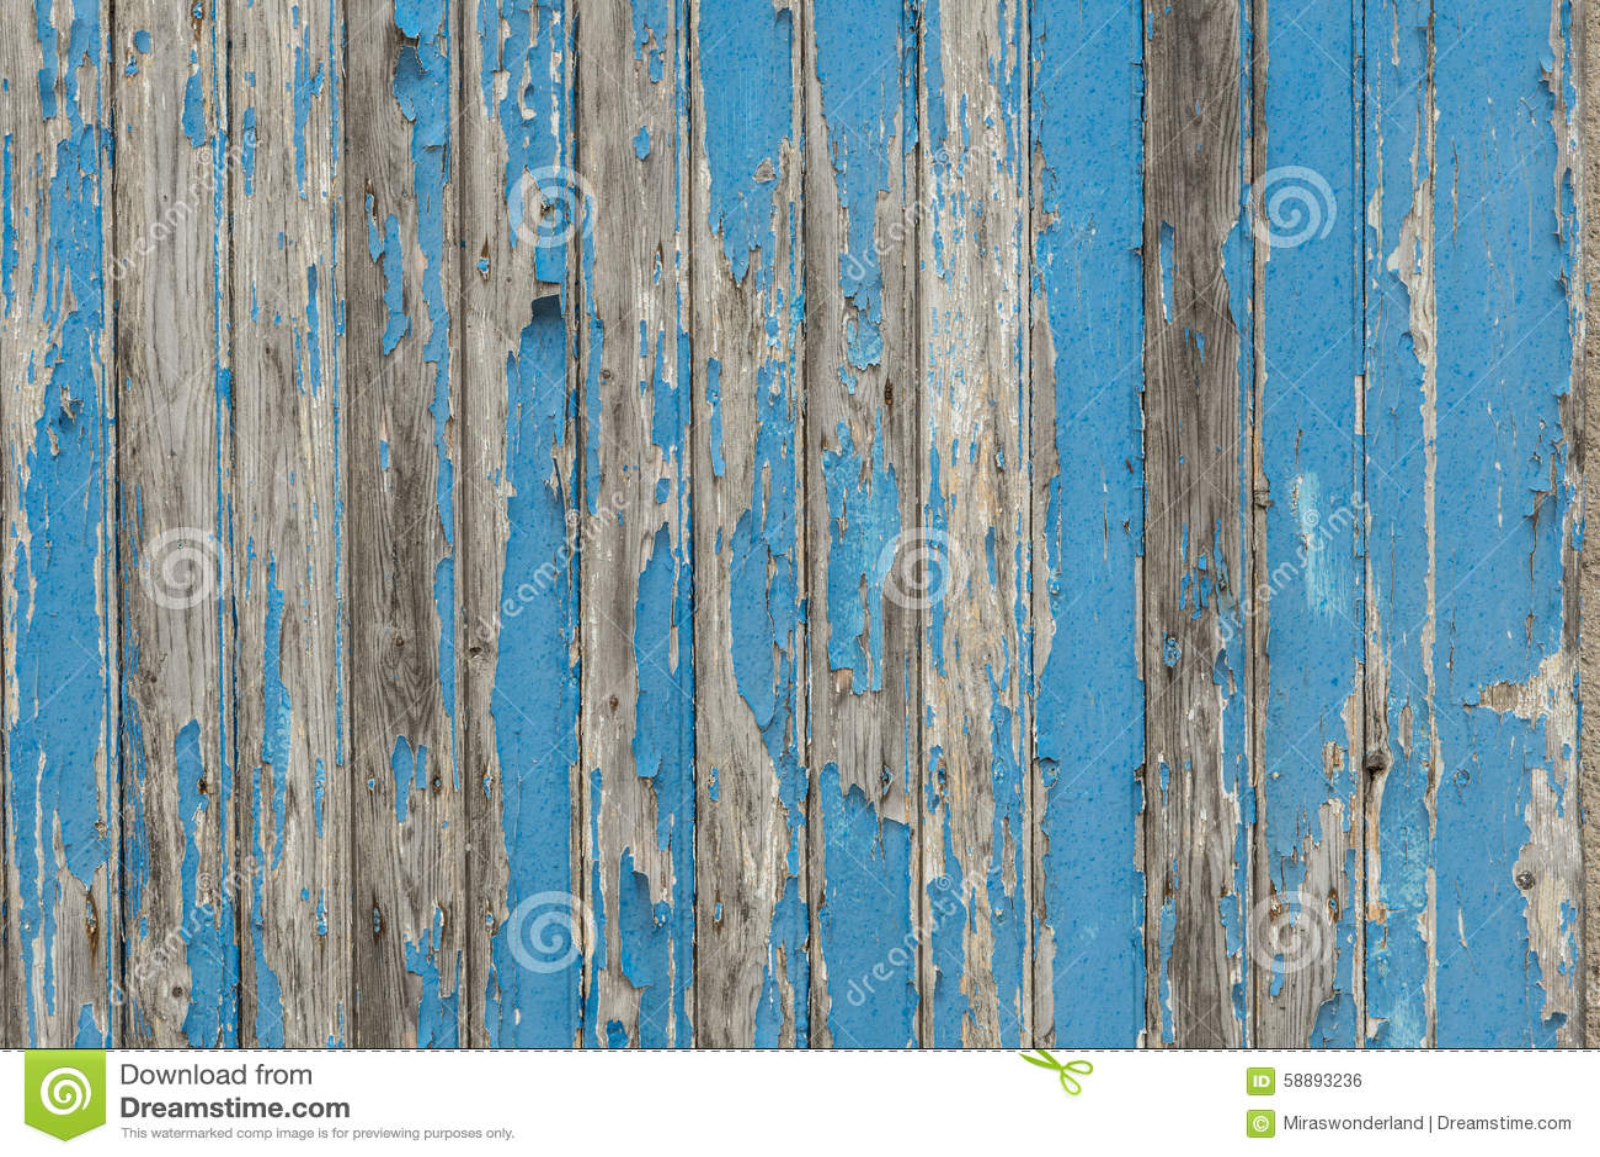 Old Blue Barn Door Shelves With Paint Peeling Of